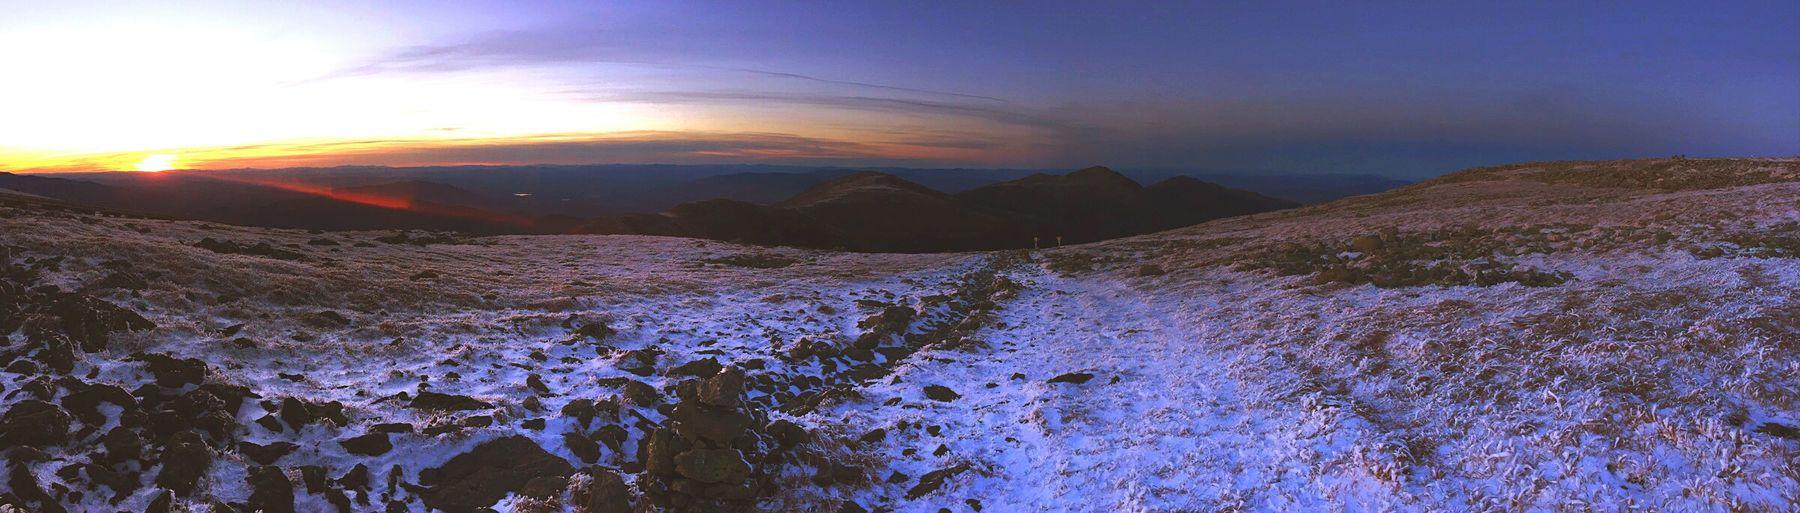 Mount Washington Backwoods Mountain Clean Air Sundown Bear Country NH Mount Washington